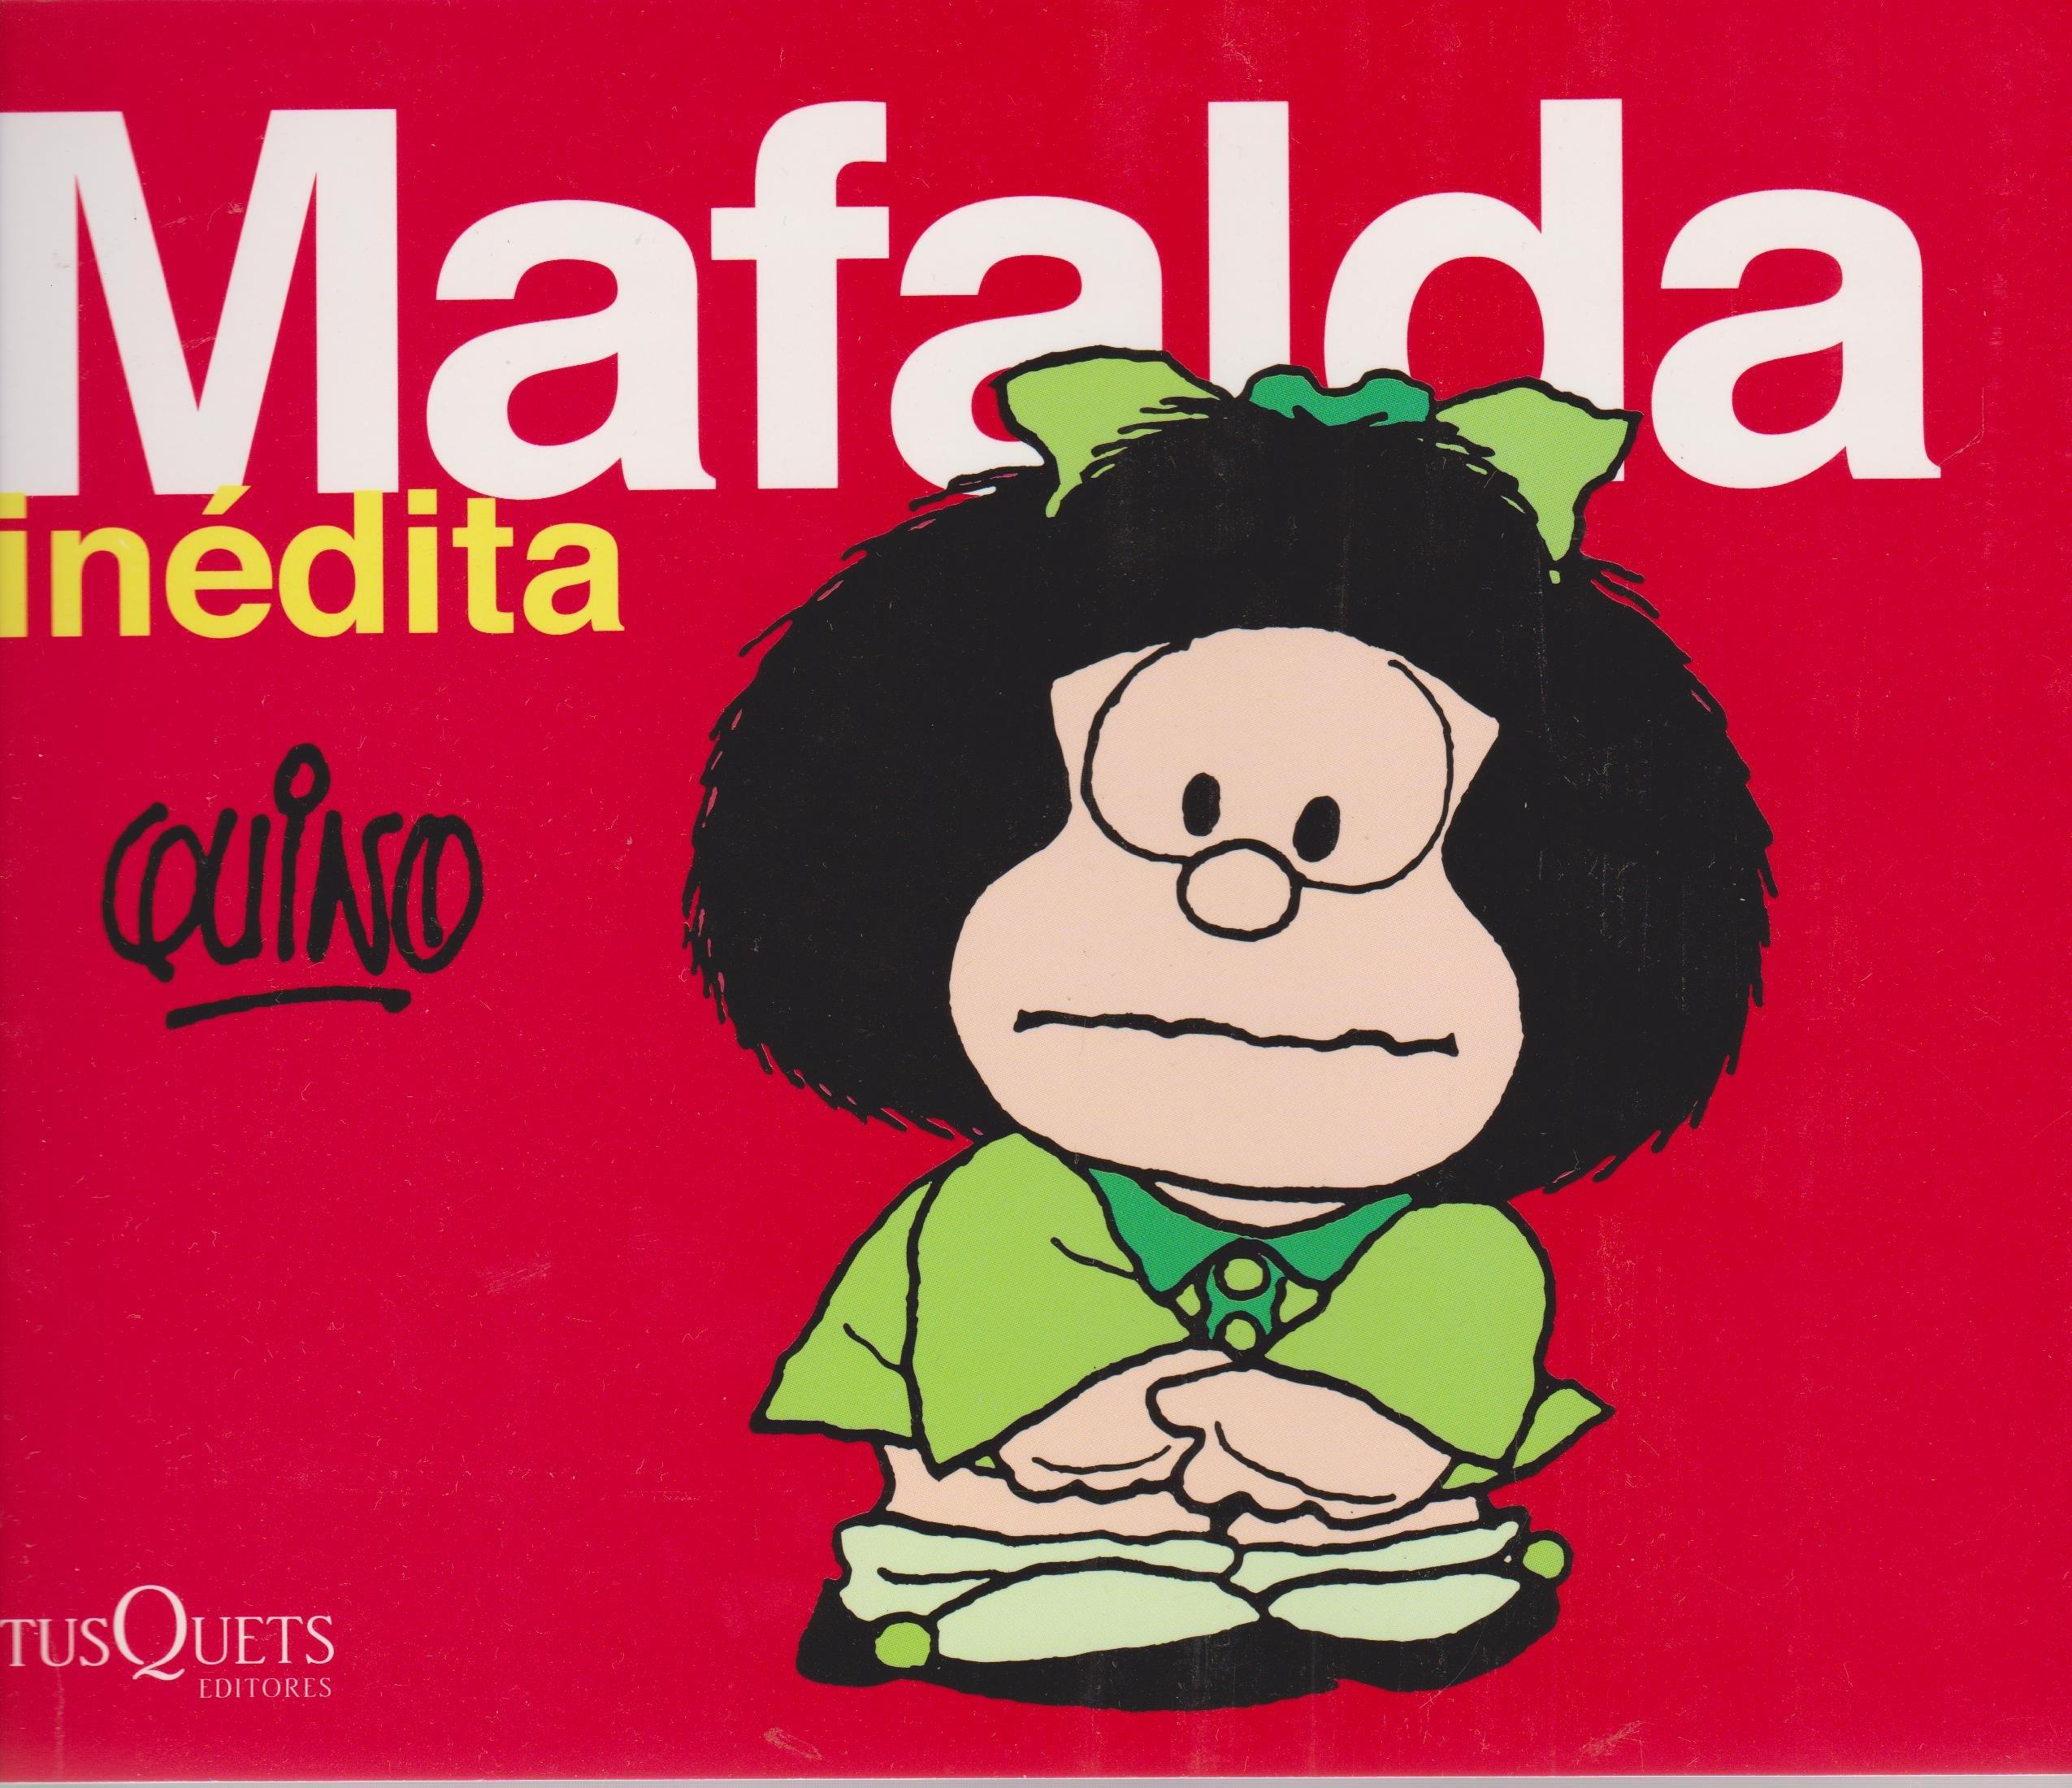 Mafalda inedita (Spanish Edition): Quino: 9786074210071: Amazon.com: Books